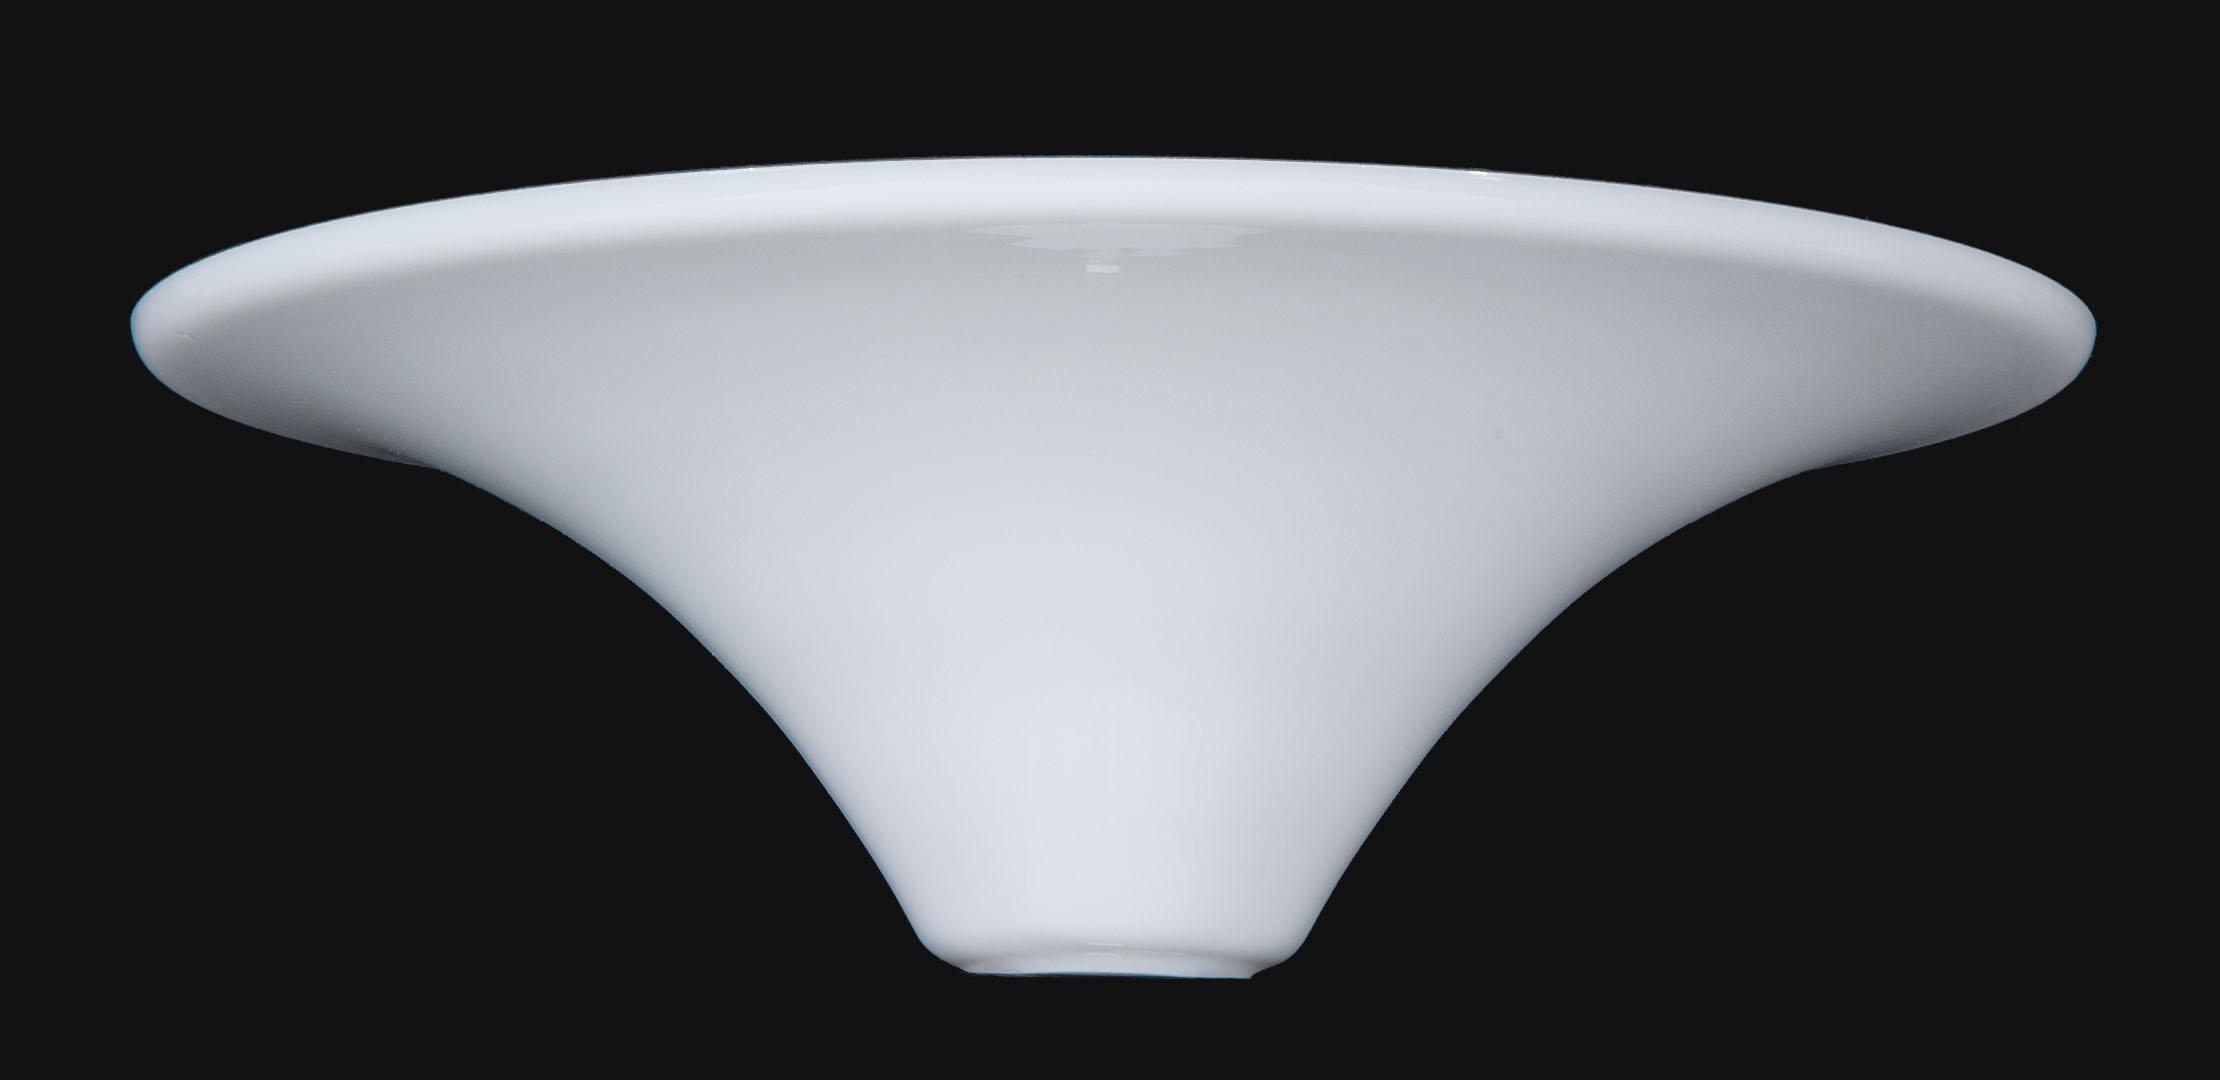 wholesale lamp parts b p lamp supply. Black Bedroom Furniture Sets. Home Design Ideas